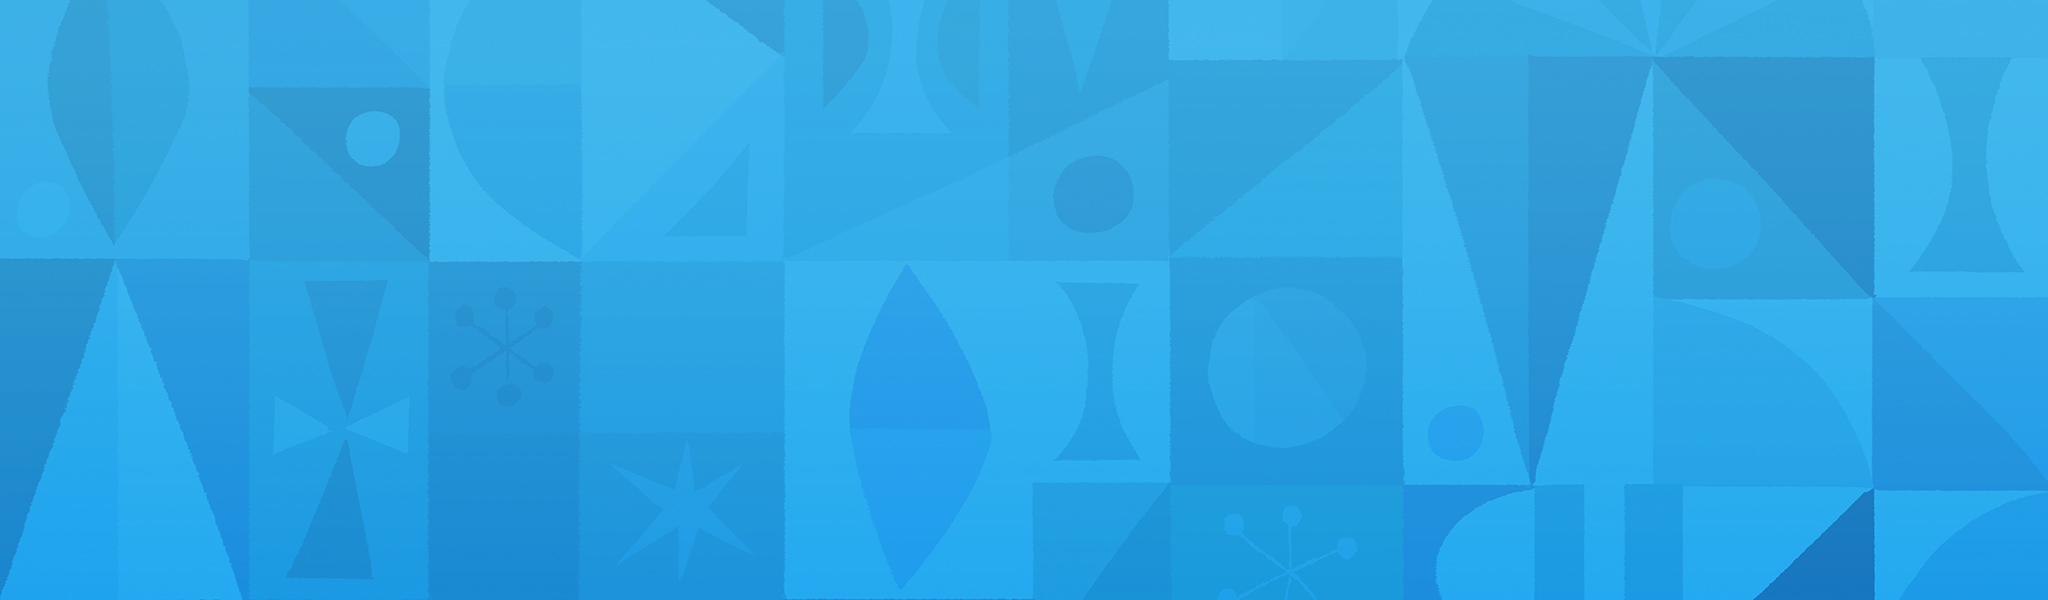 Pattern-Blue_2048x600